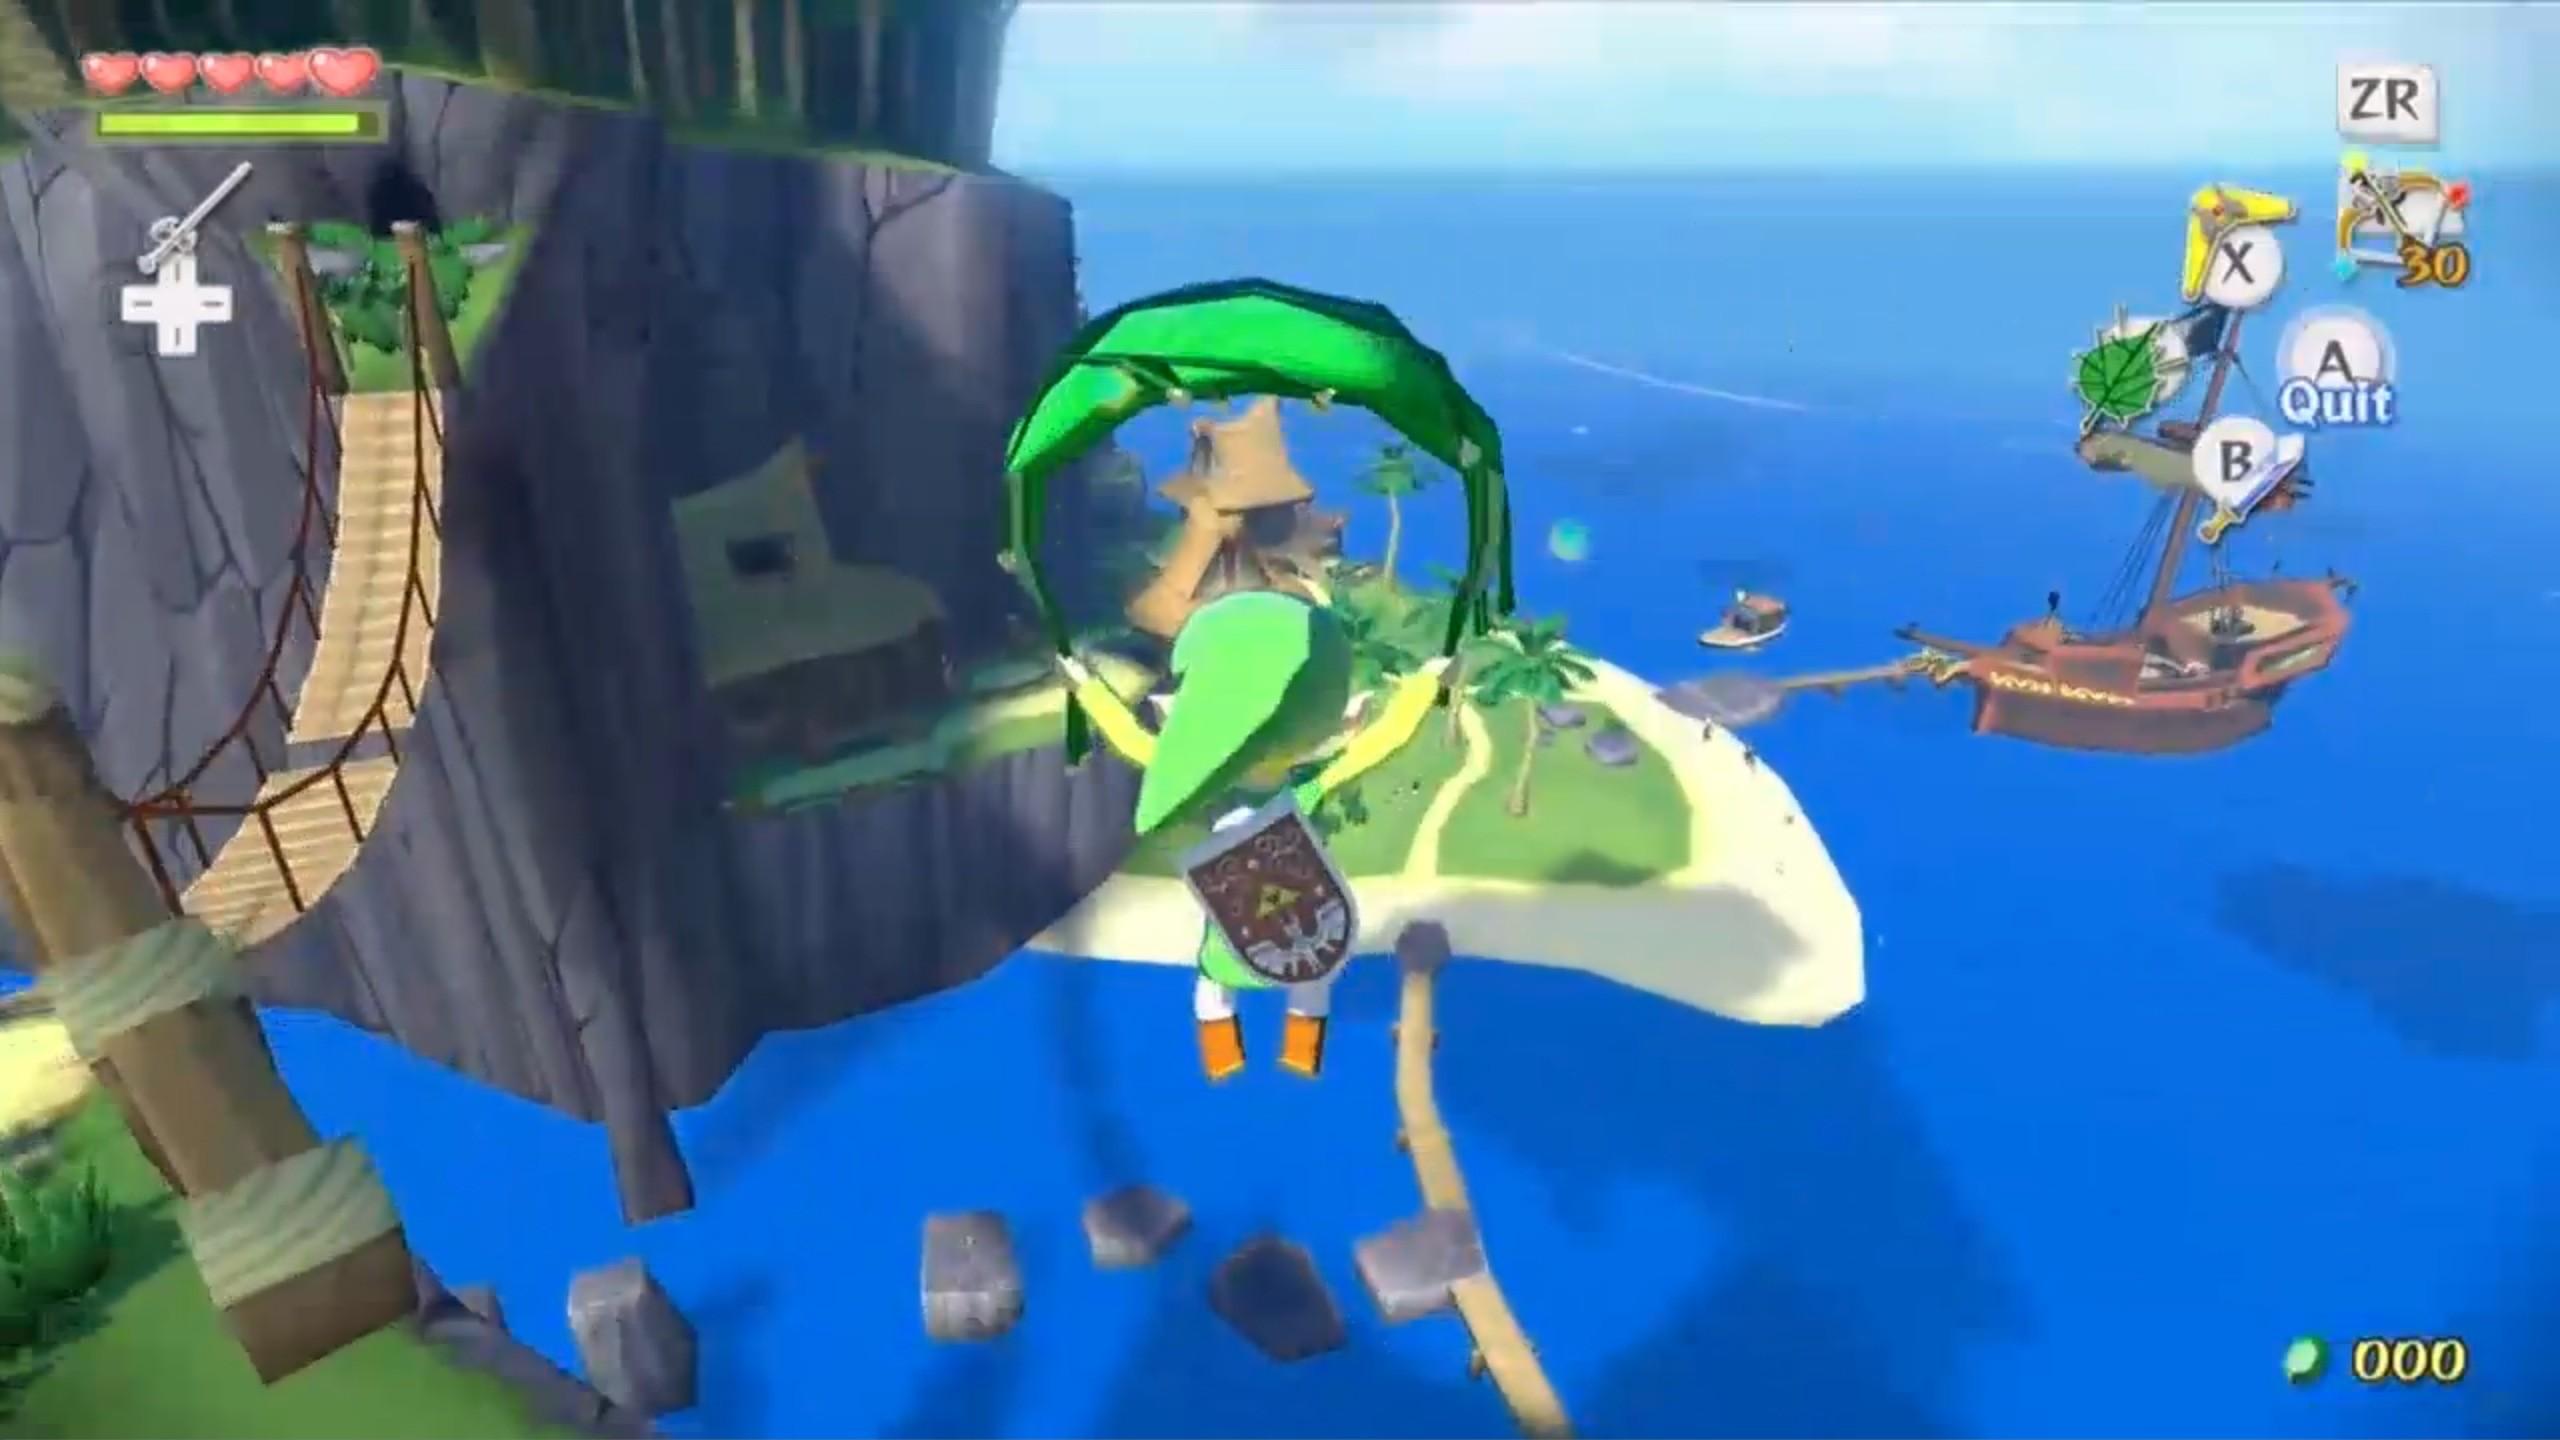 Nintendo of America Reveals Their Wind Waker HD Boxart; It's Pretty, Too